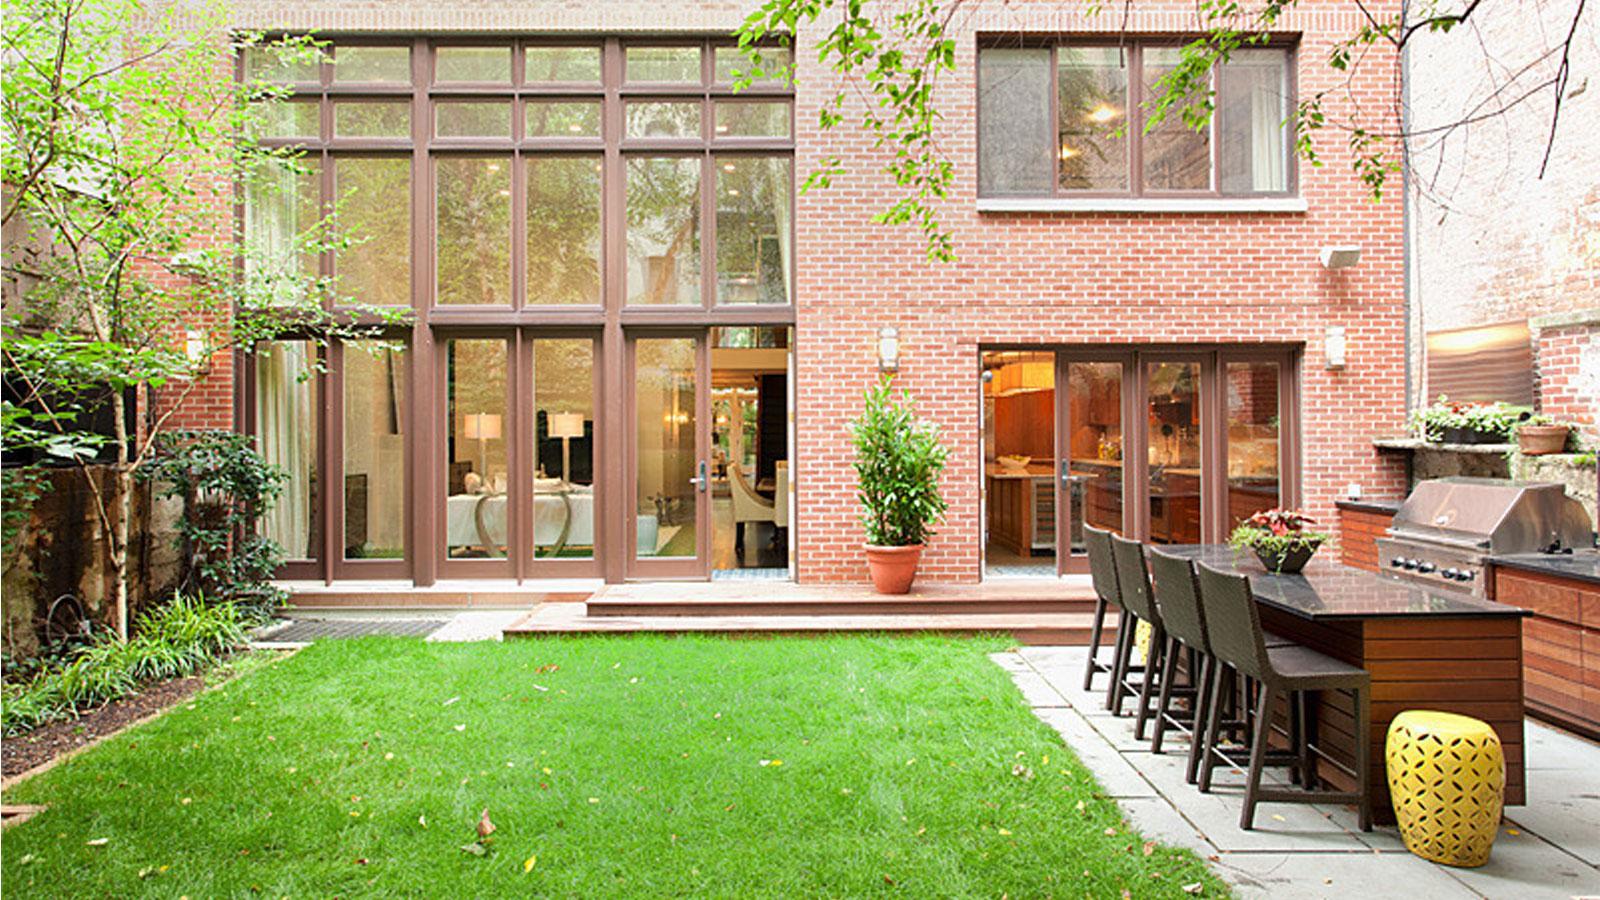 95 Charles Street, NYC - Condo Apartments | CityRealty